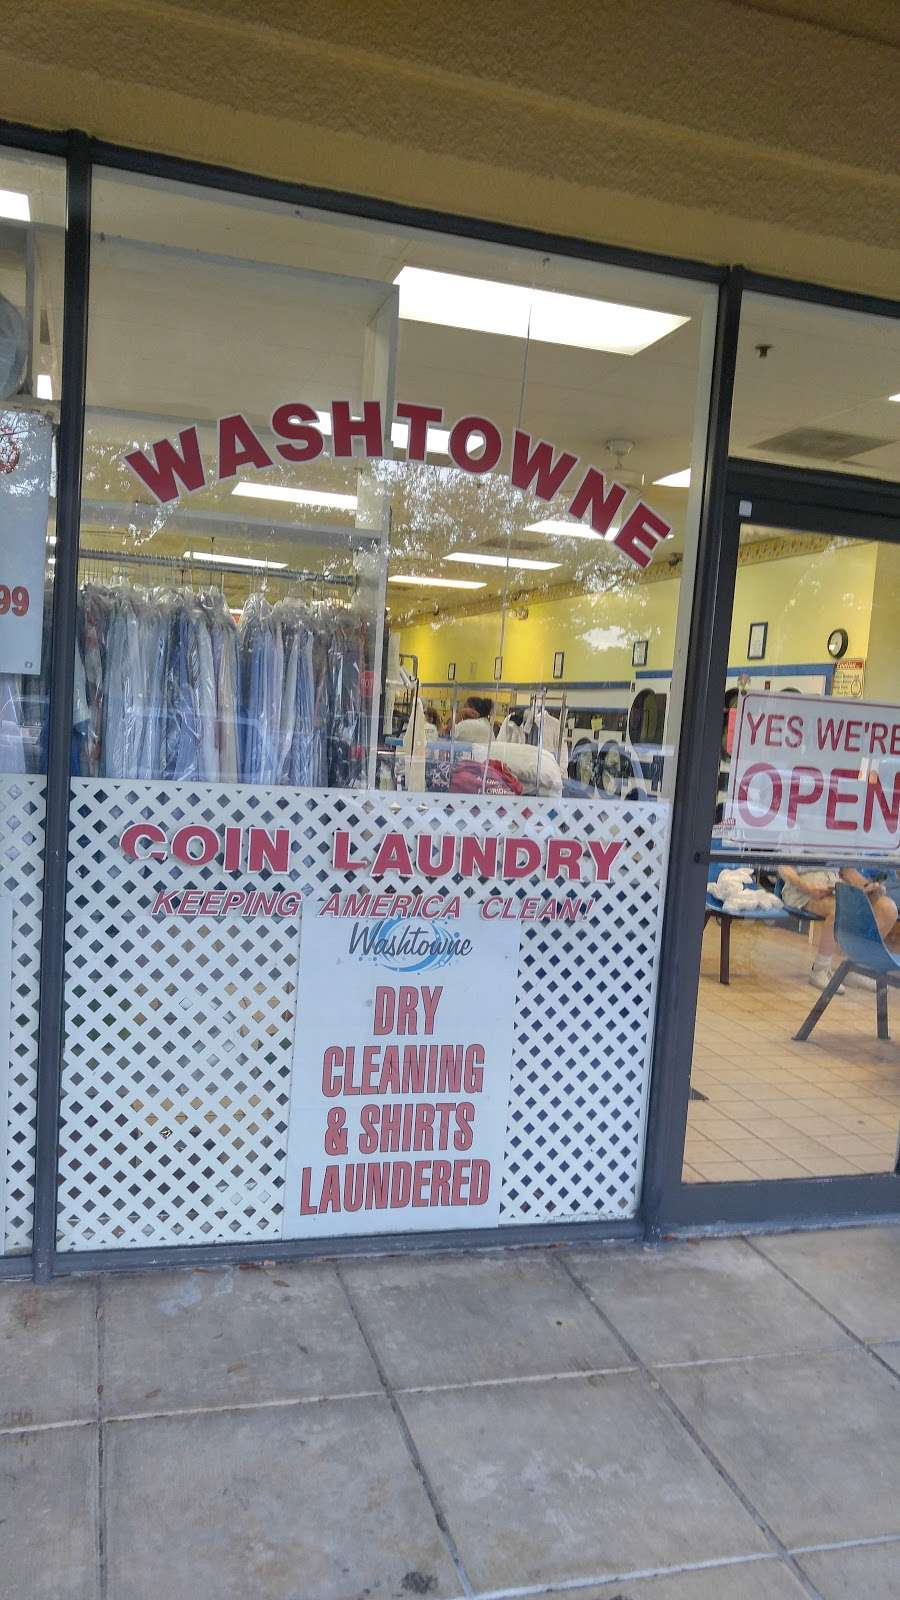 Coin Laundry - laundry  | Photo 2 of 2 | Address: 240 Central Blvd, Jupiter, FL 33458, USA